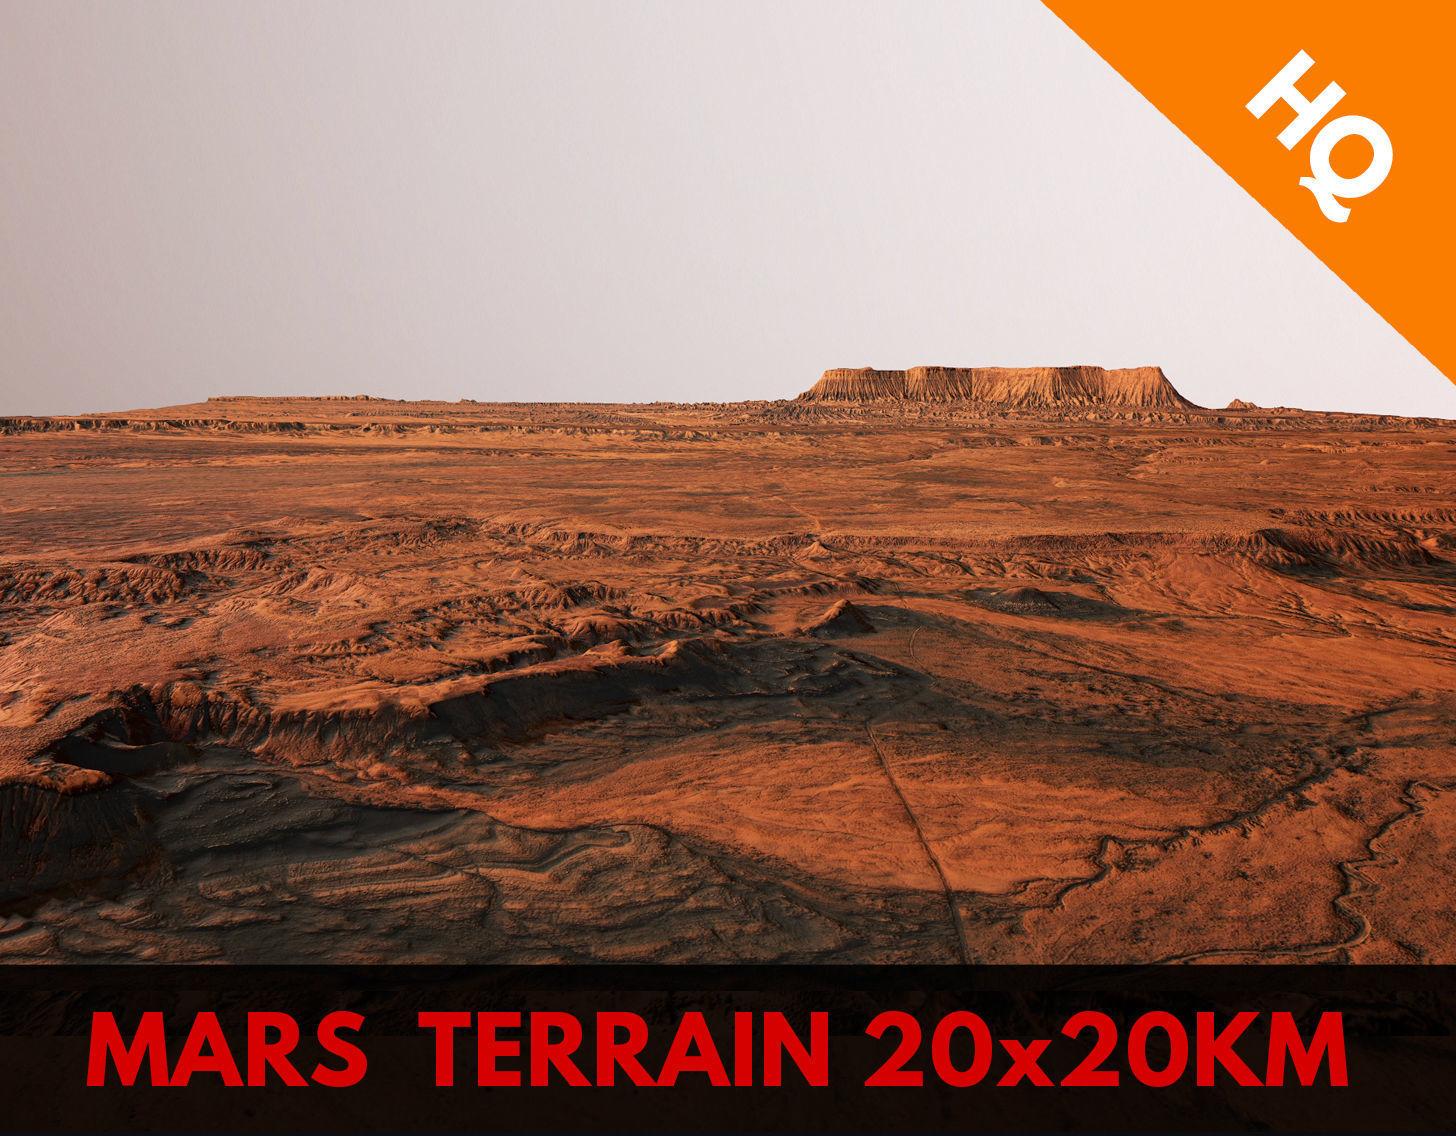 Mars Planet Landscape 20x20km Desert Terrain Valley PBR